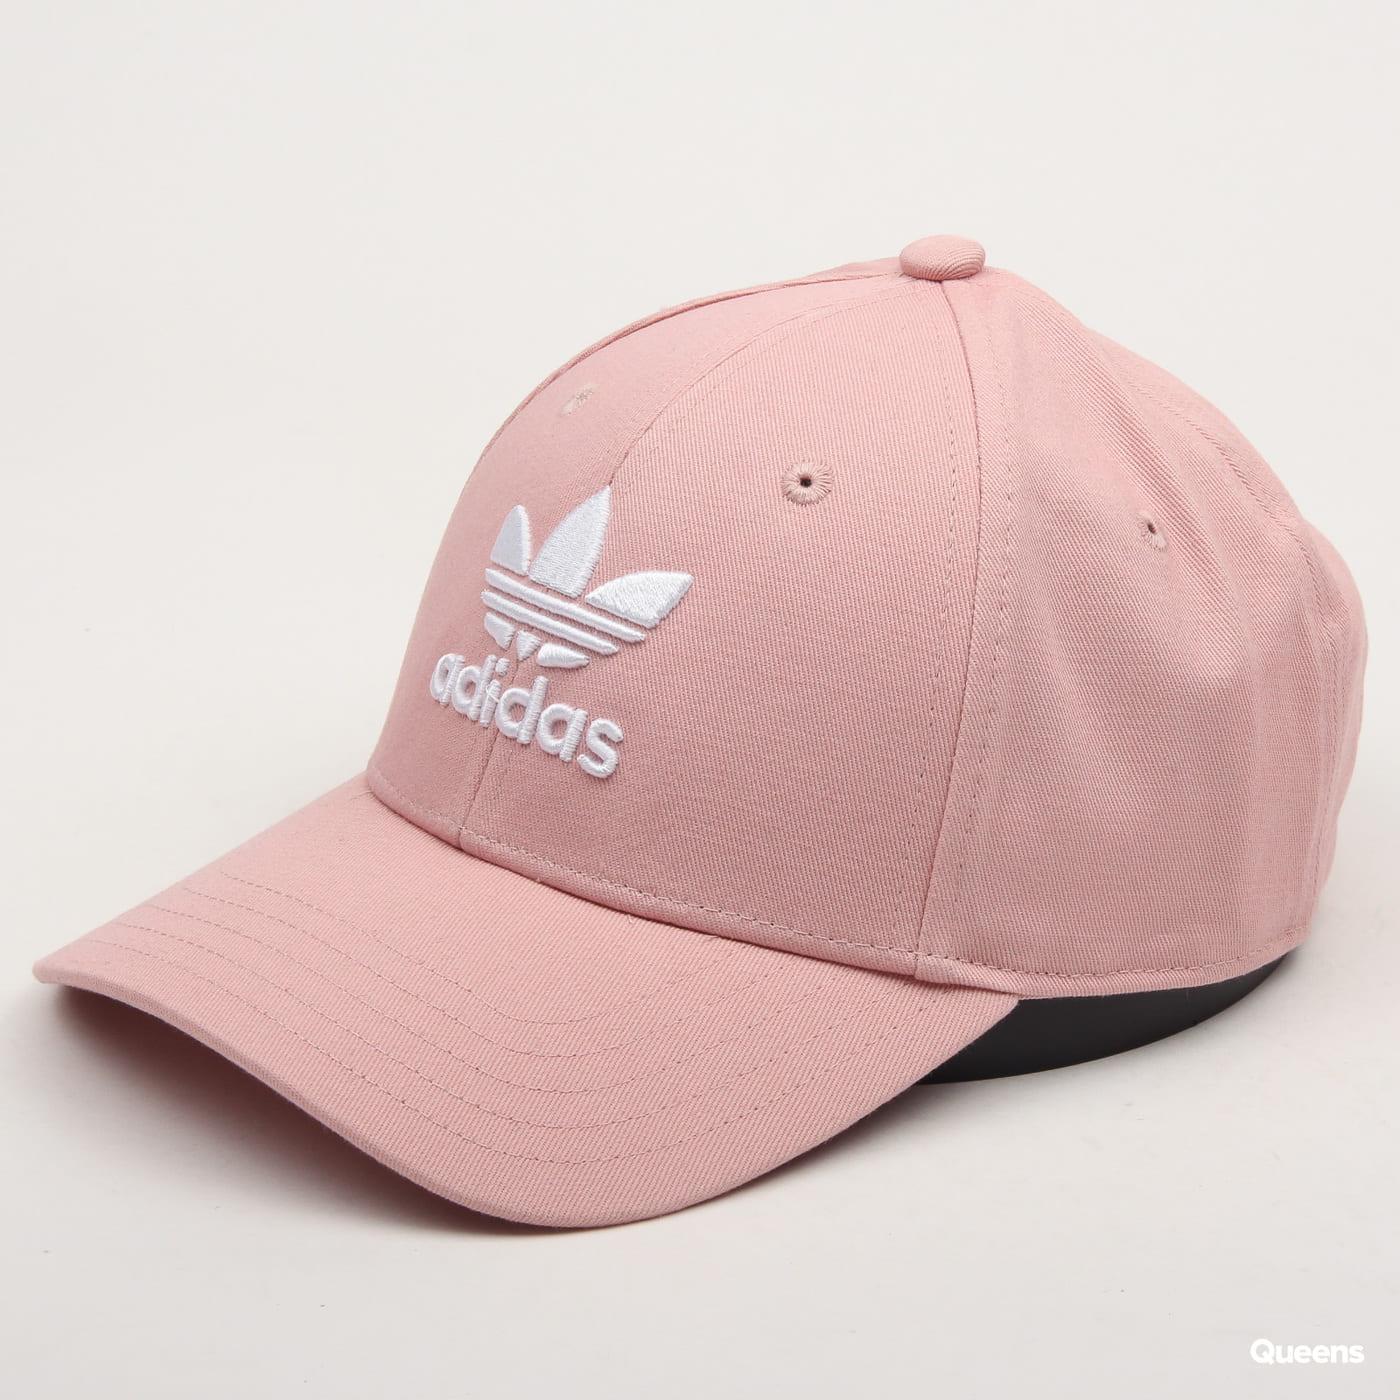 adidas Originals Bases Classic Trefoil pink